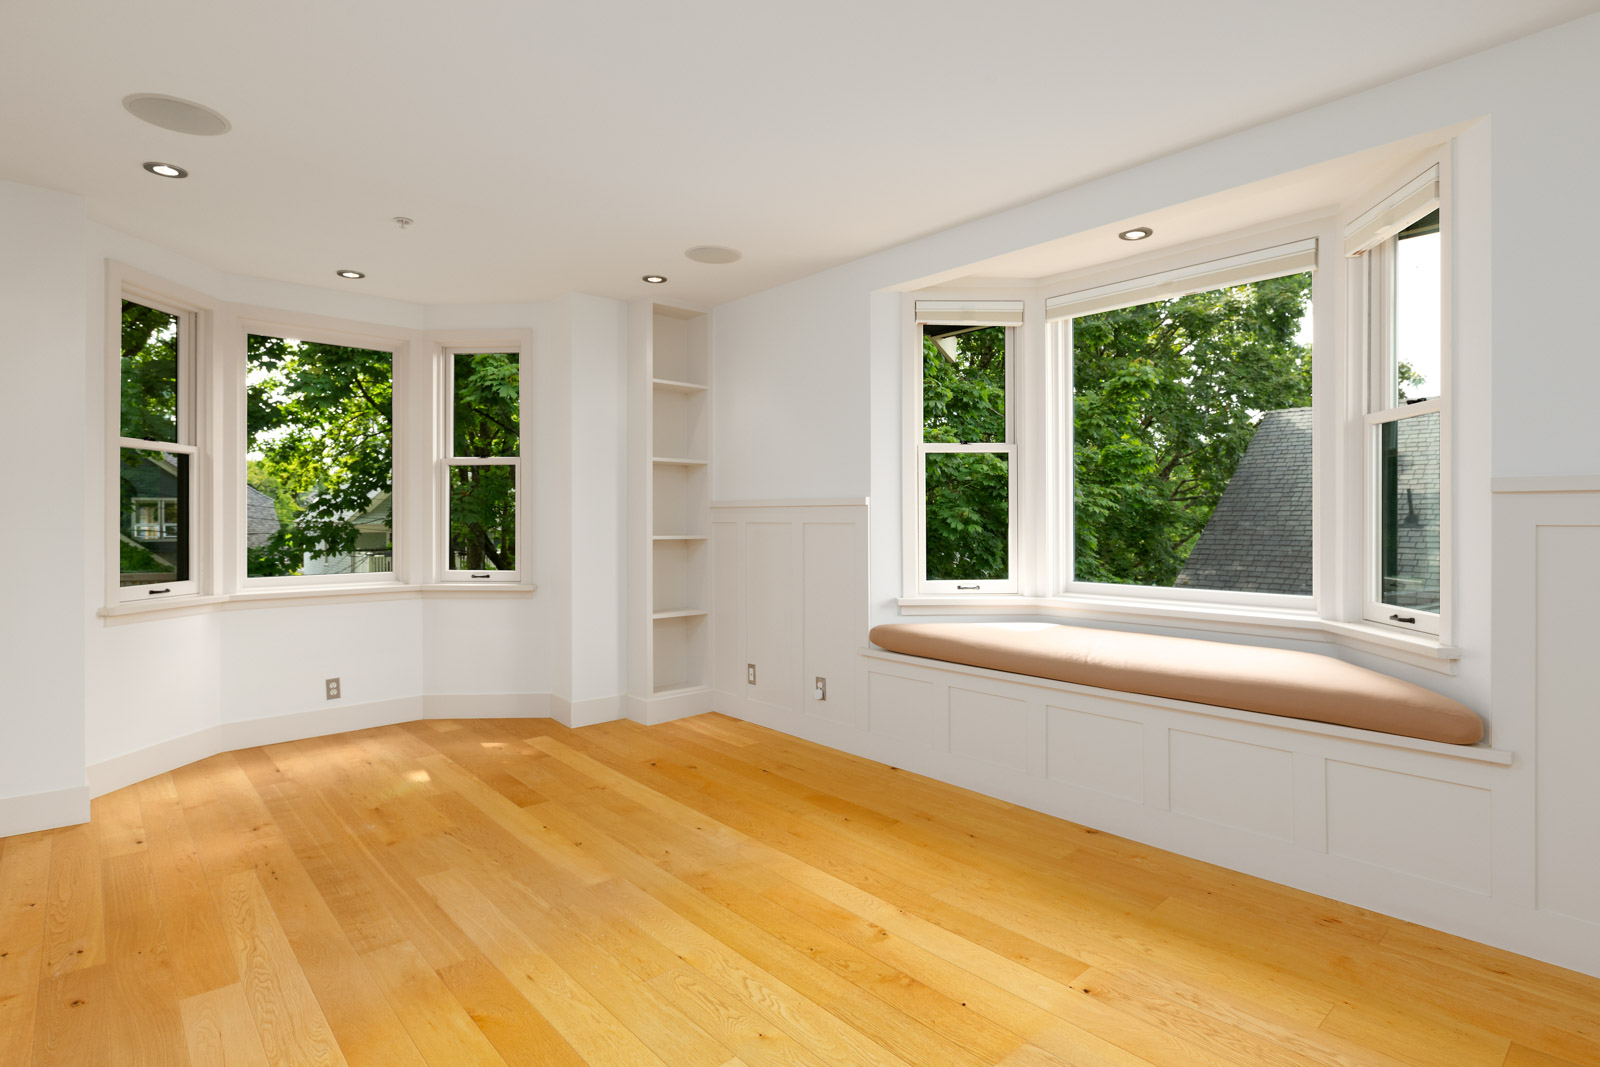 spacious living area with hardwood floor